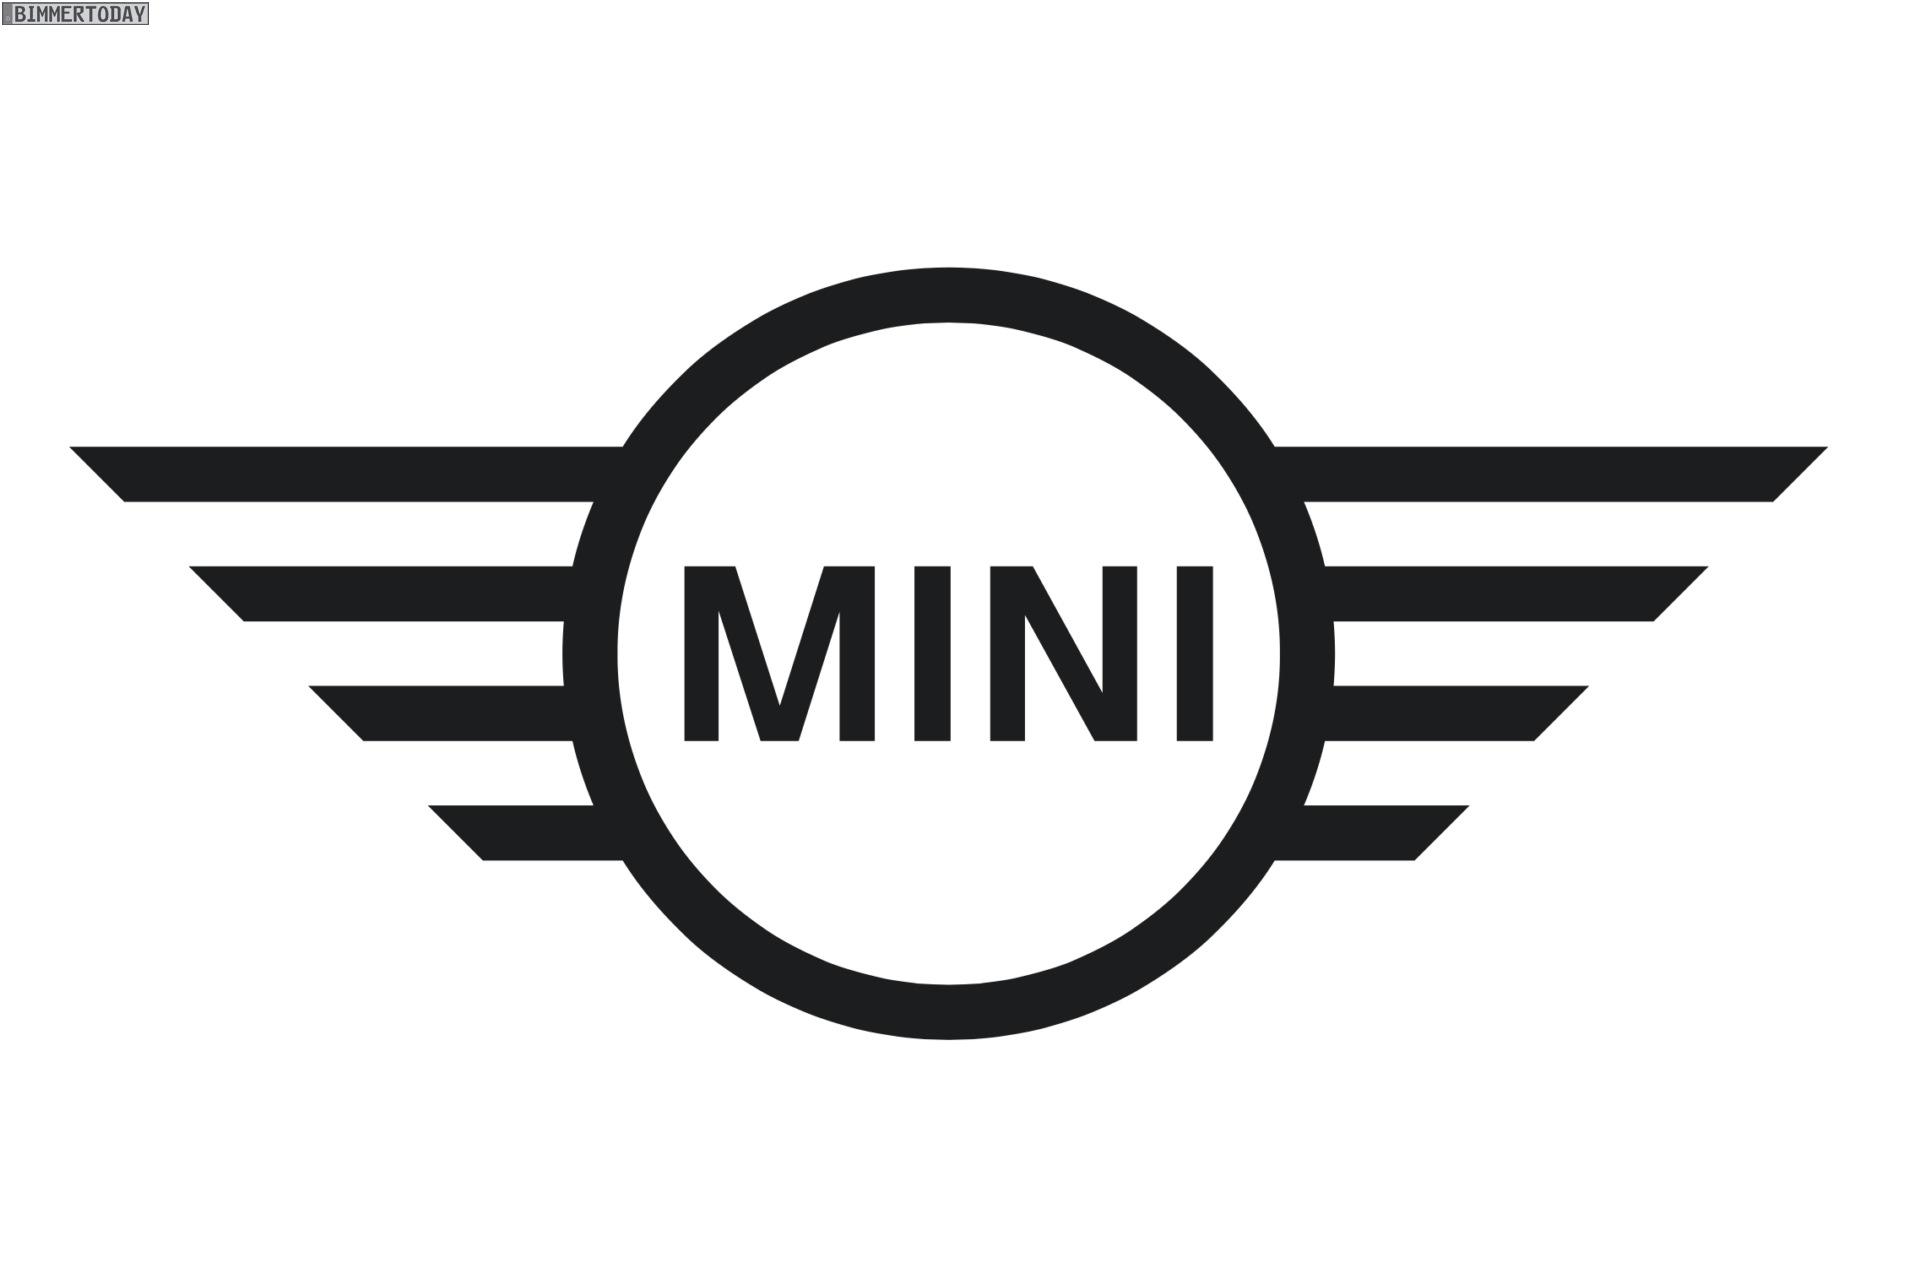 [INFORMATION] Nouveau logo Citroën MINI-Logo-2016